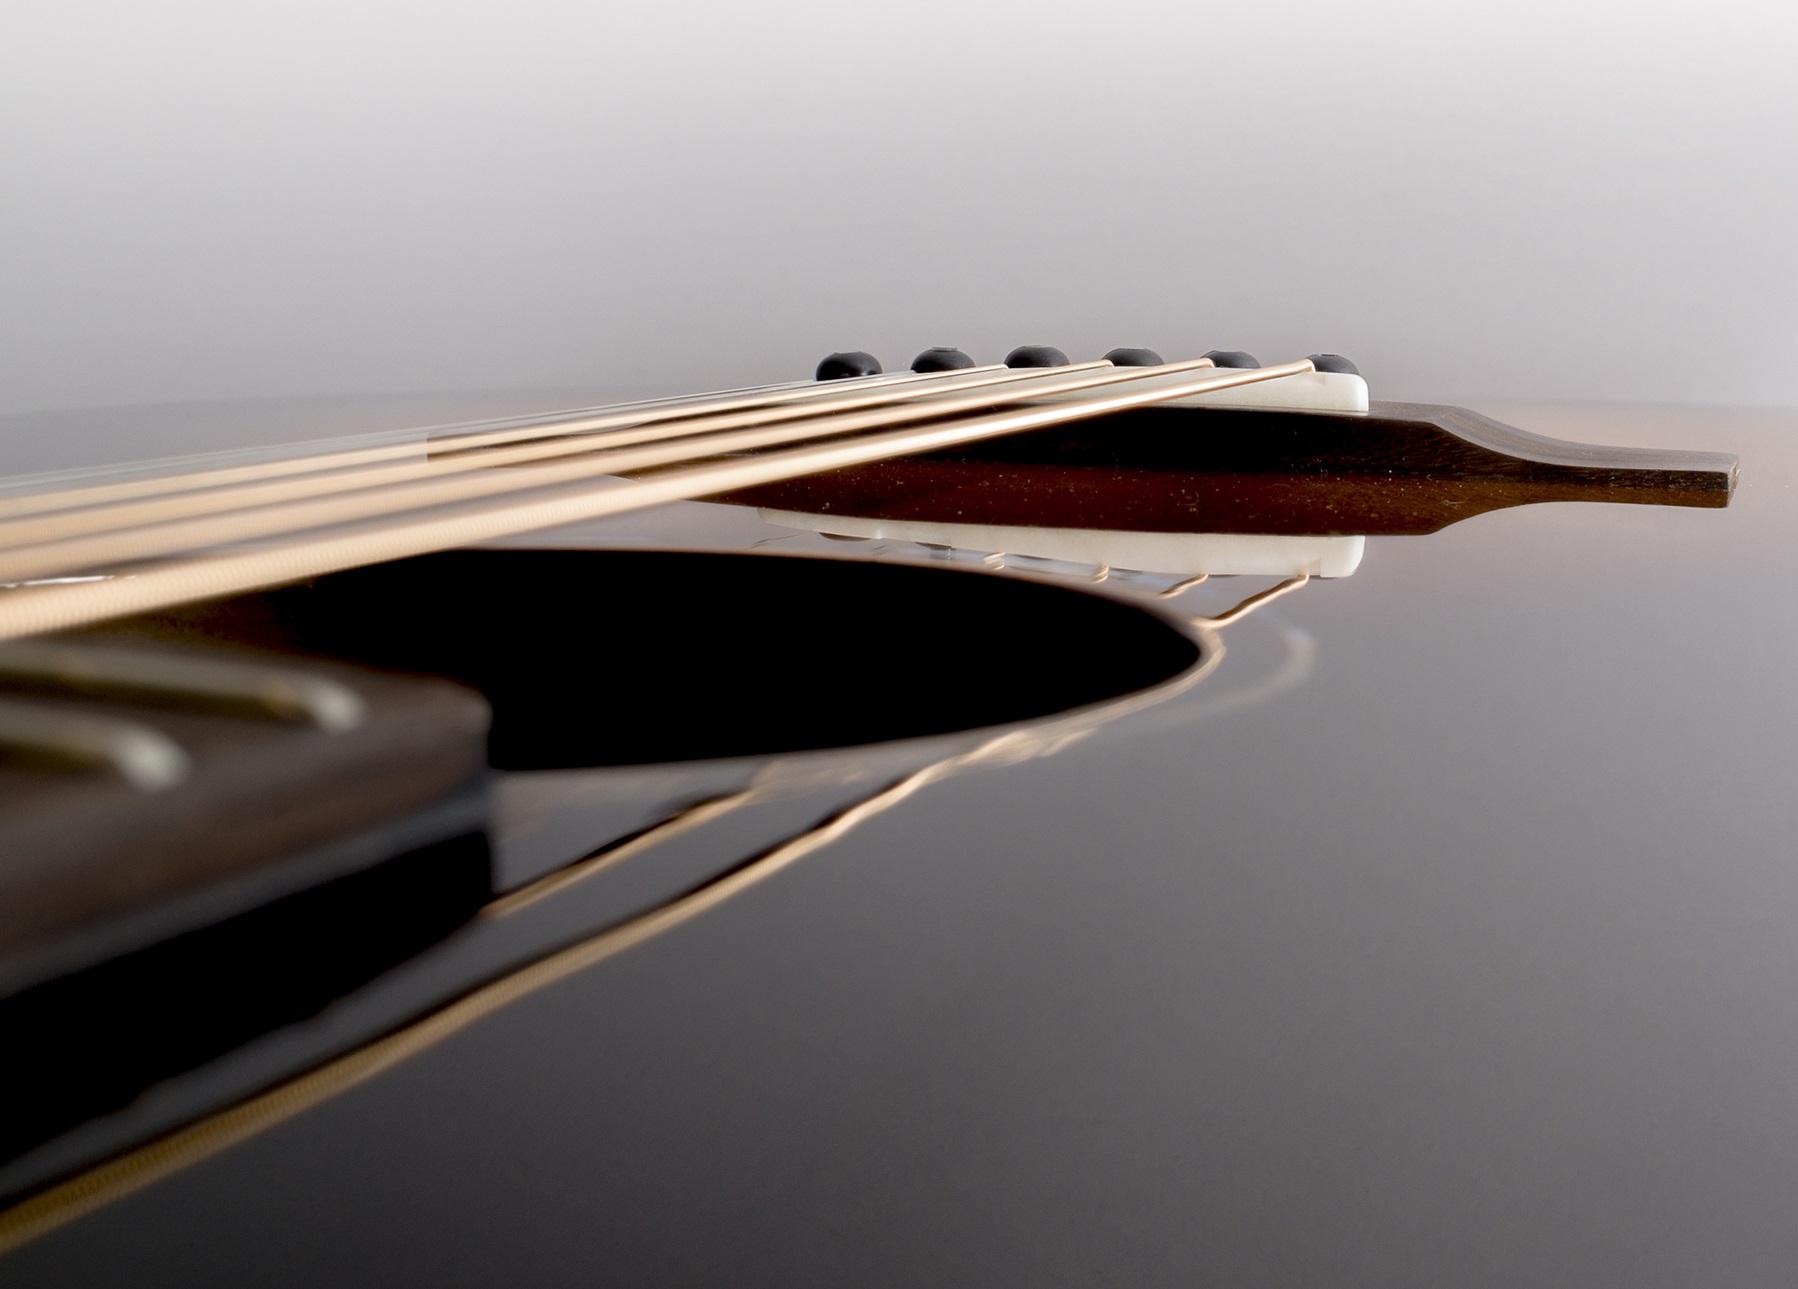 Alvarez Guitar Finish - Andertons Music Co.